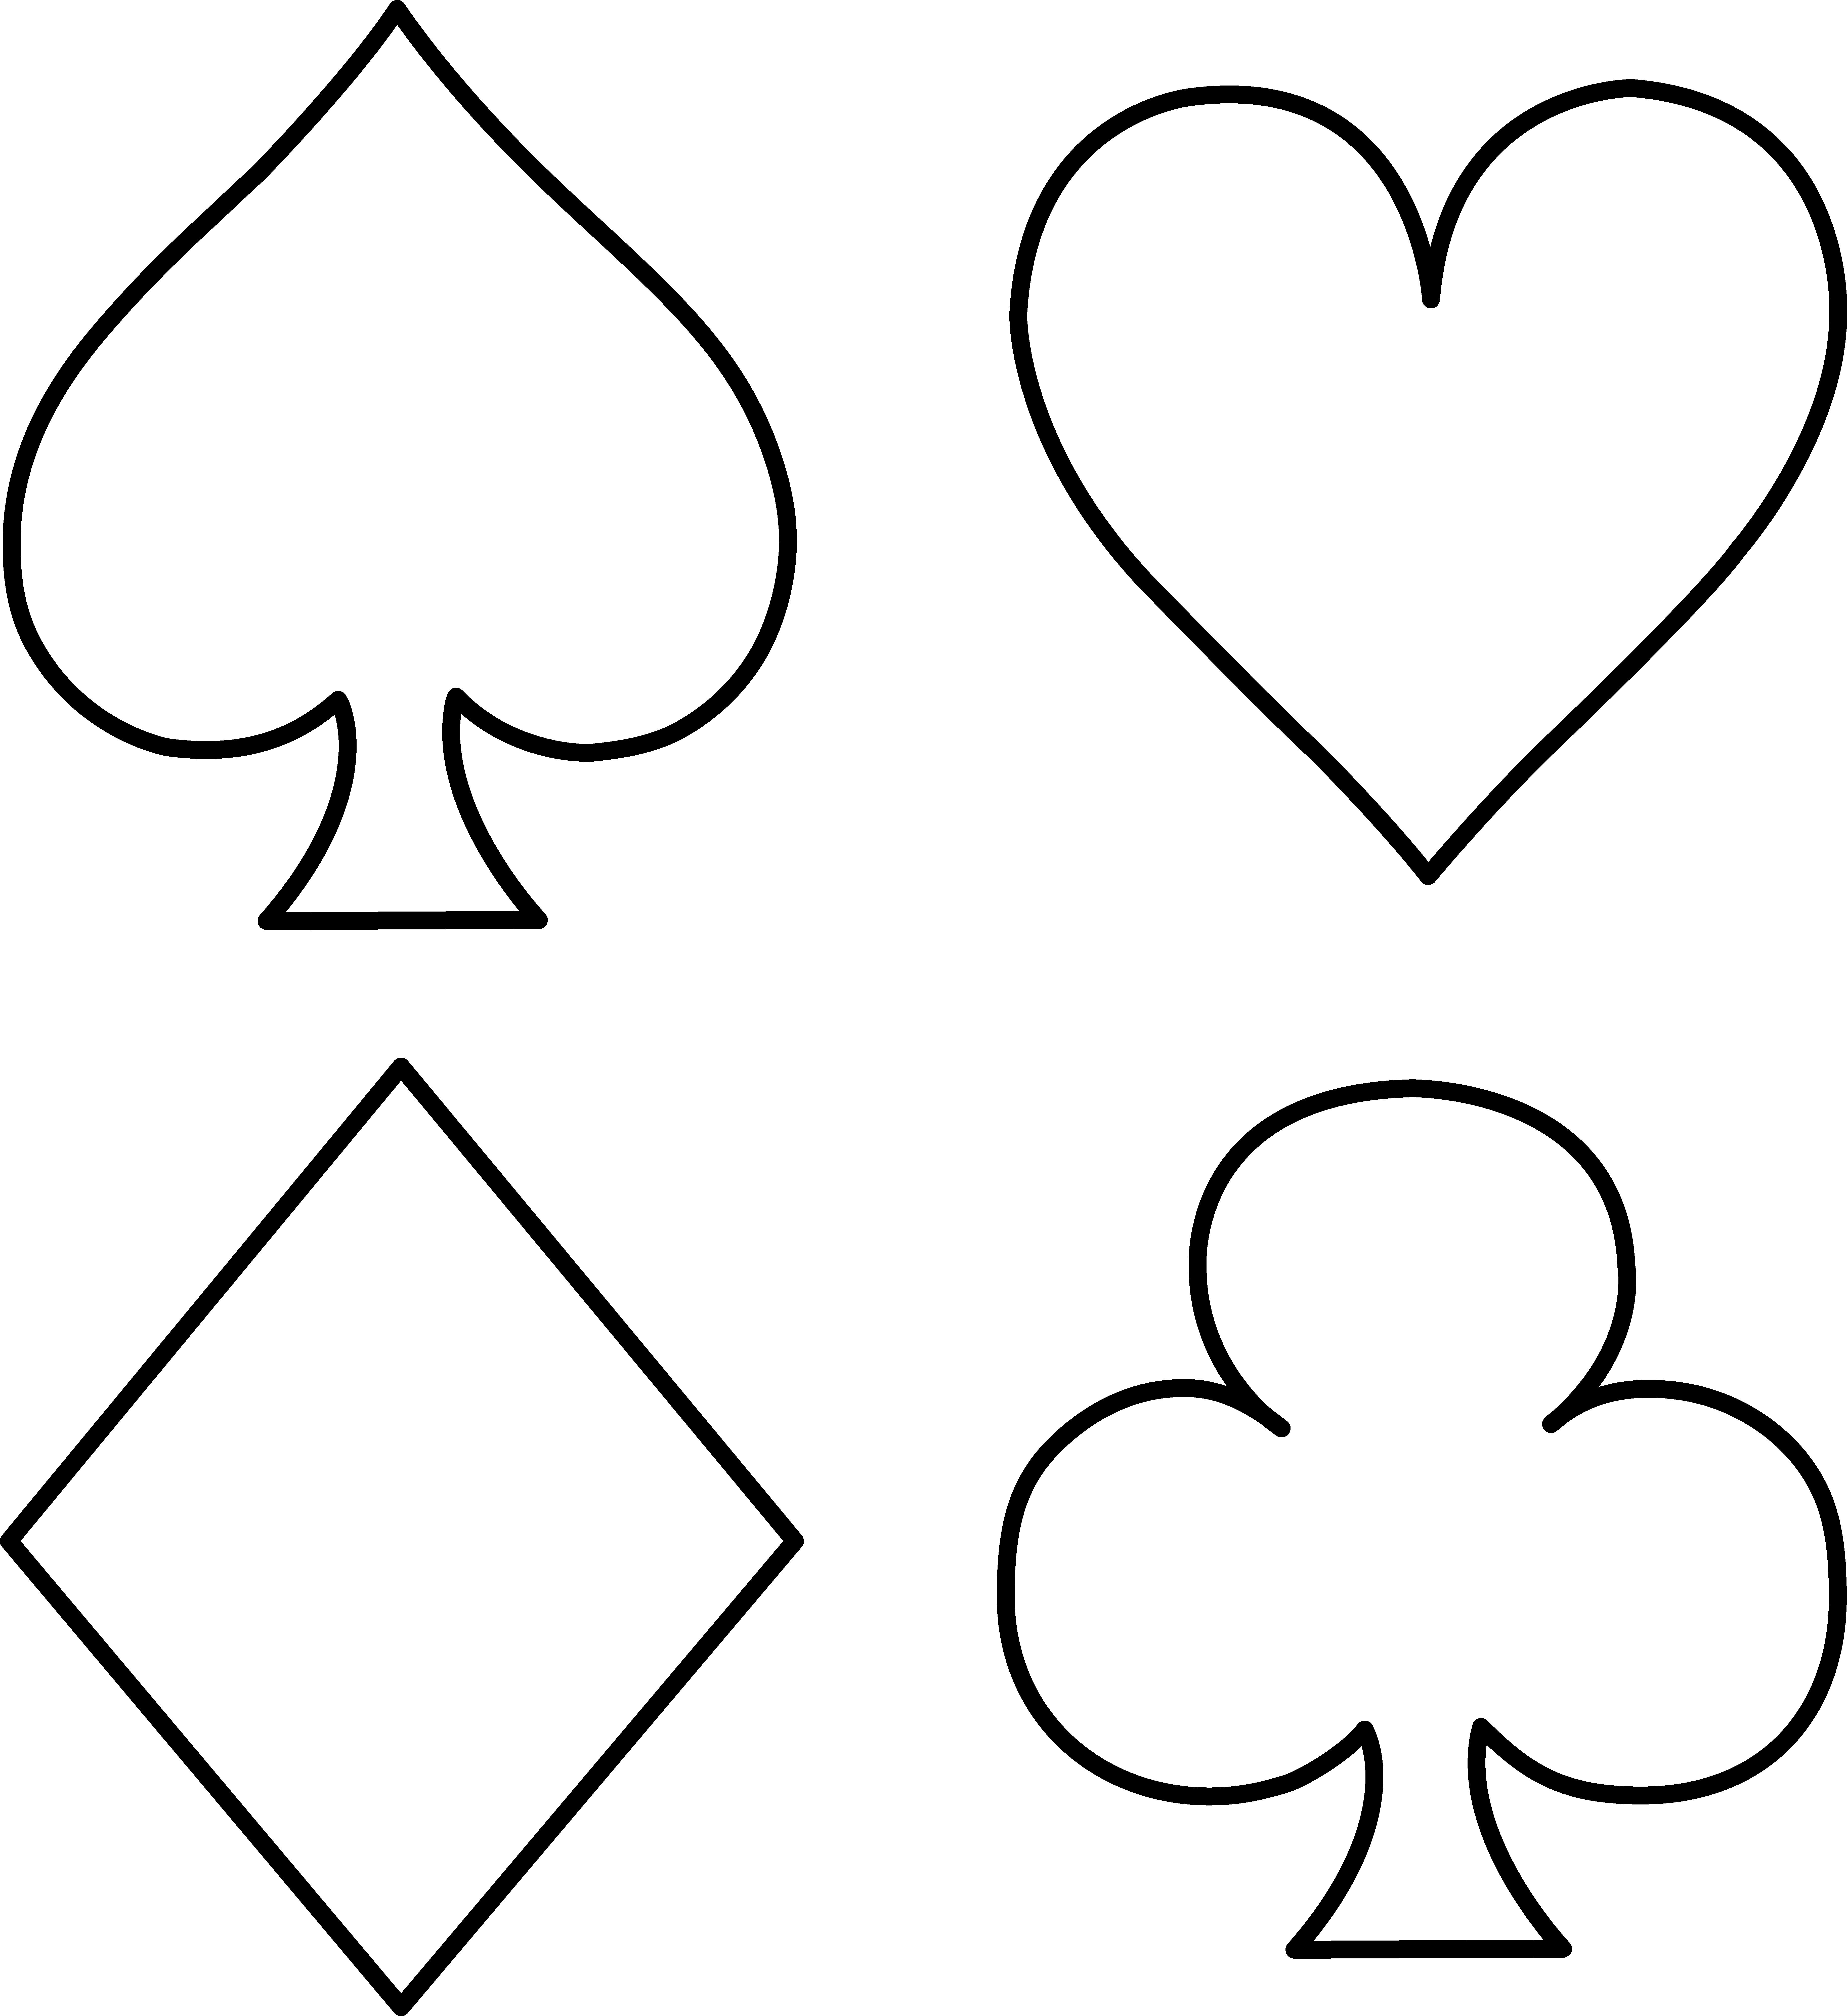 Free Deck Of Card Symbols, Download Free Clip Art, Free Clip.